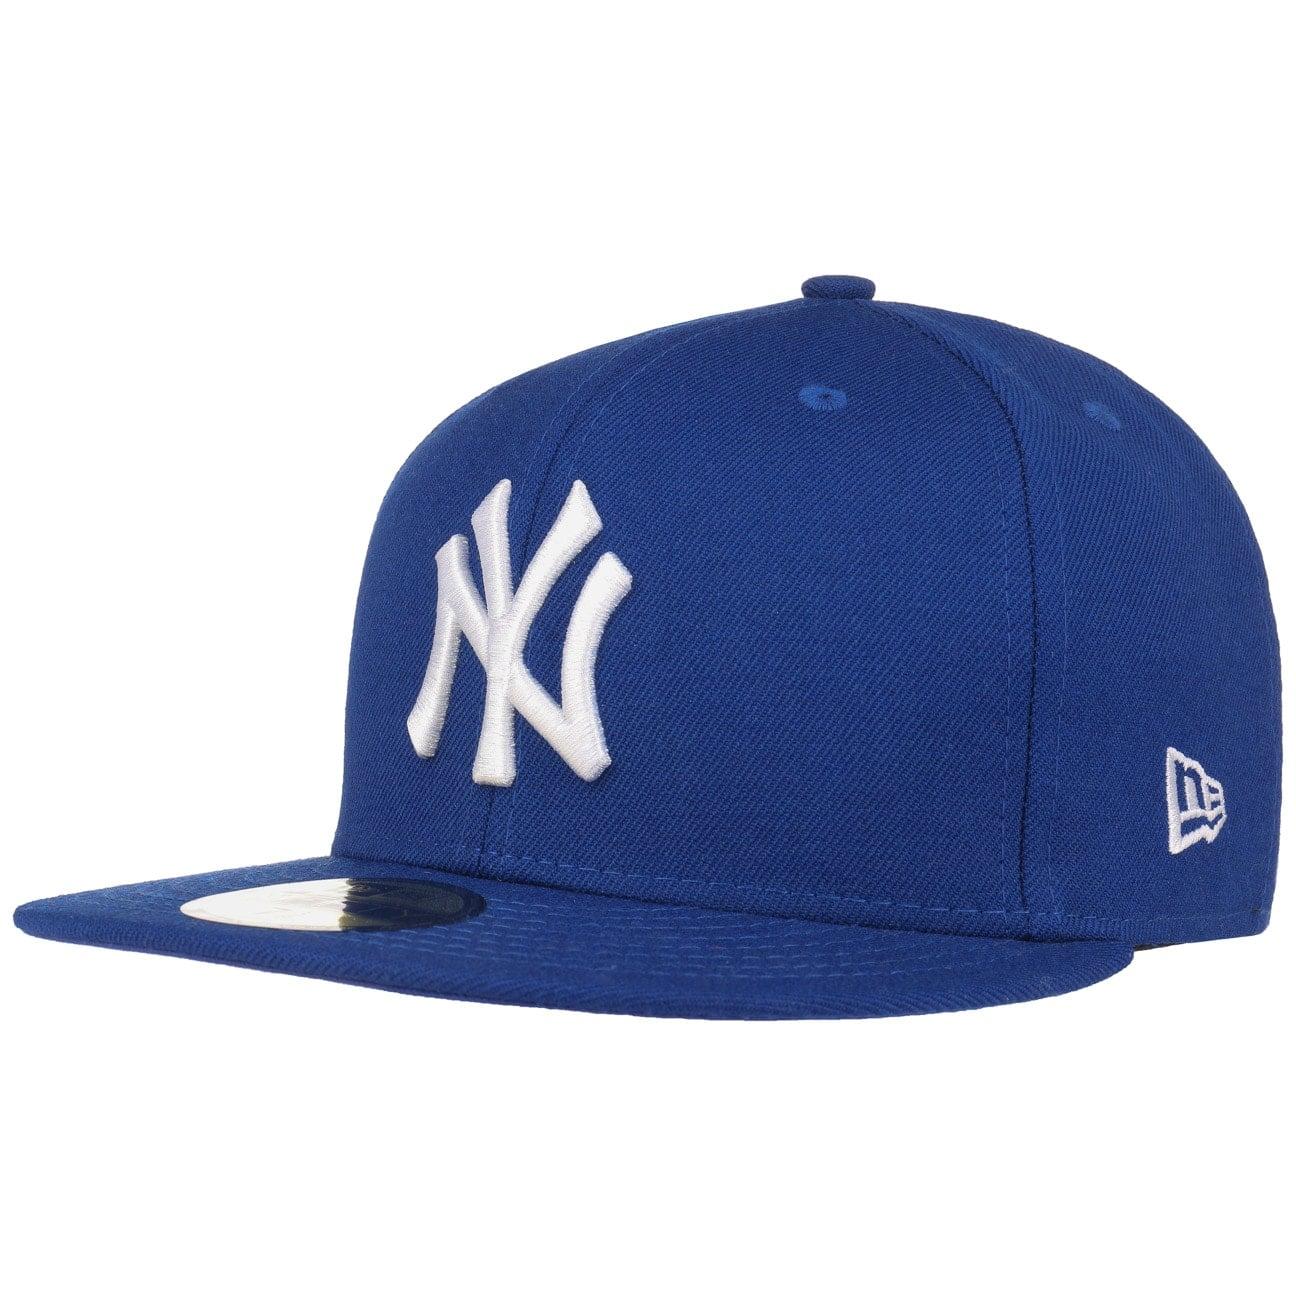 59Fifty Gorra MLB Basic NY by New Era